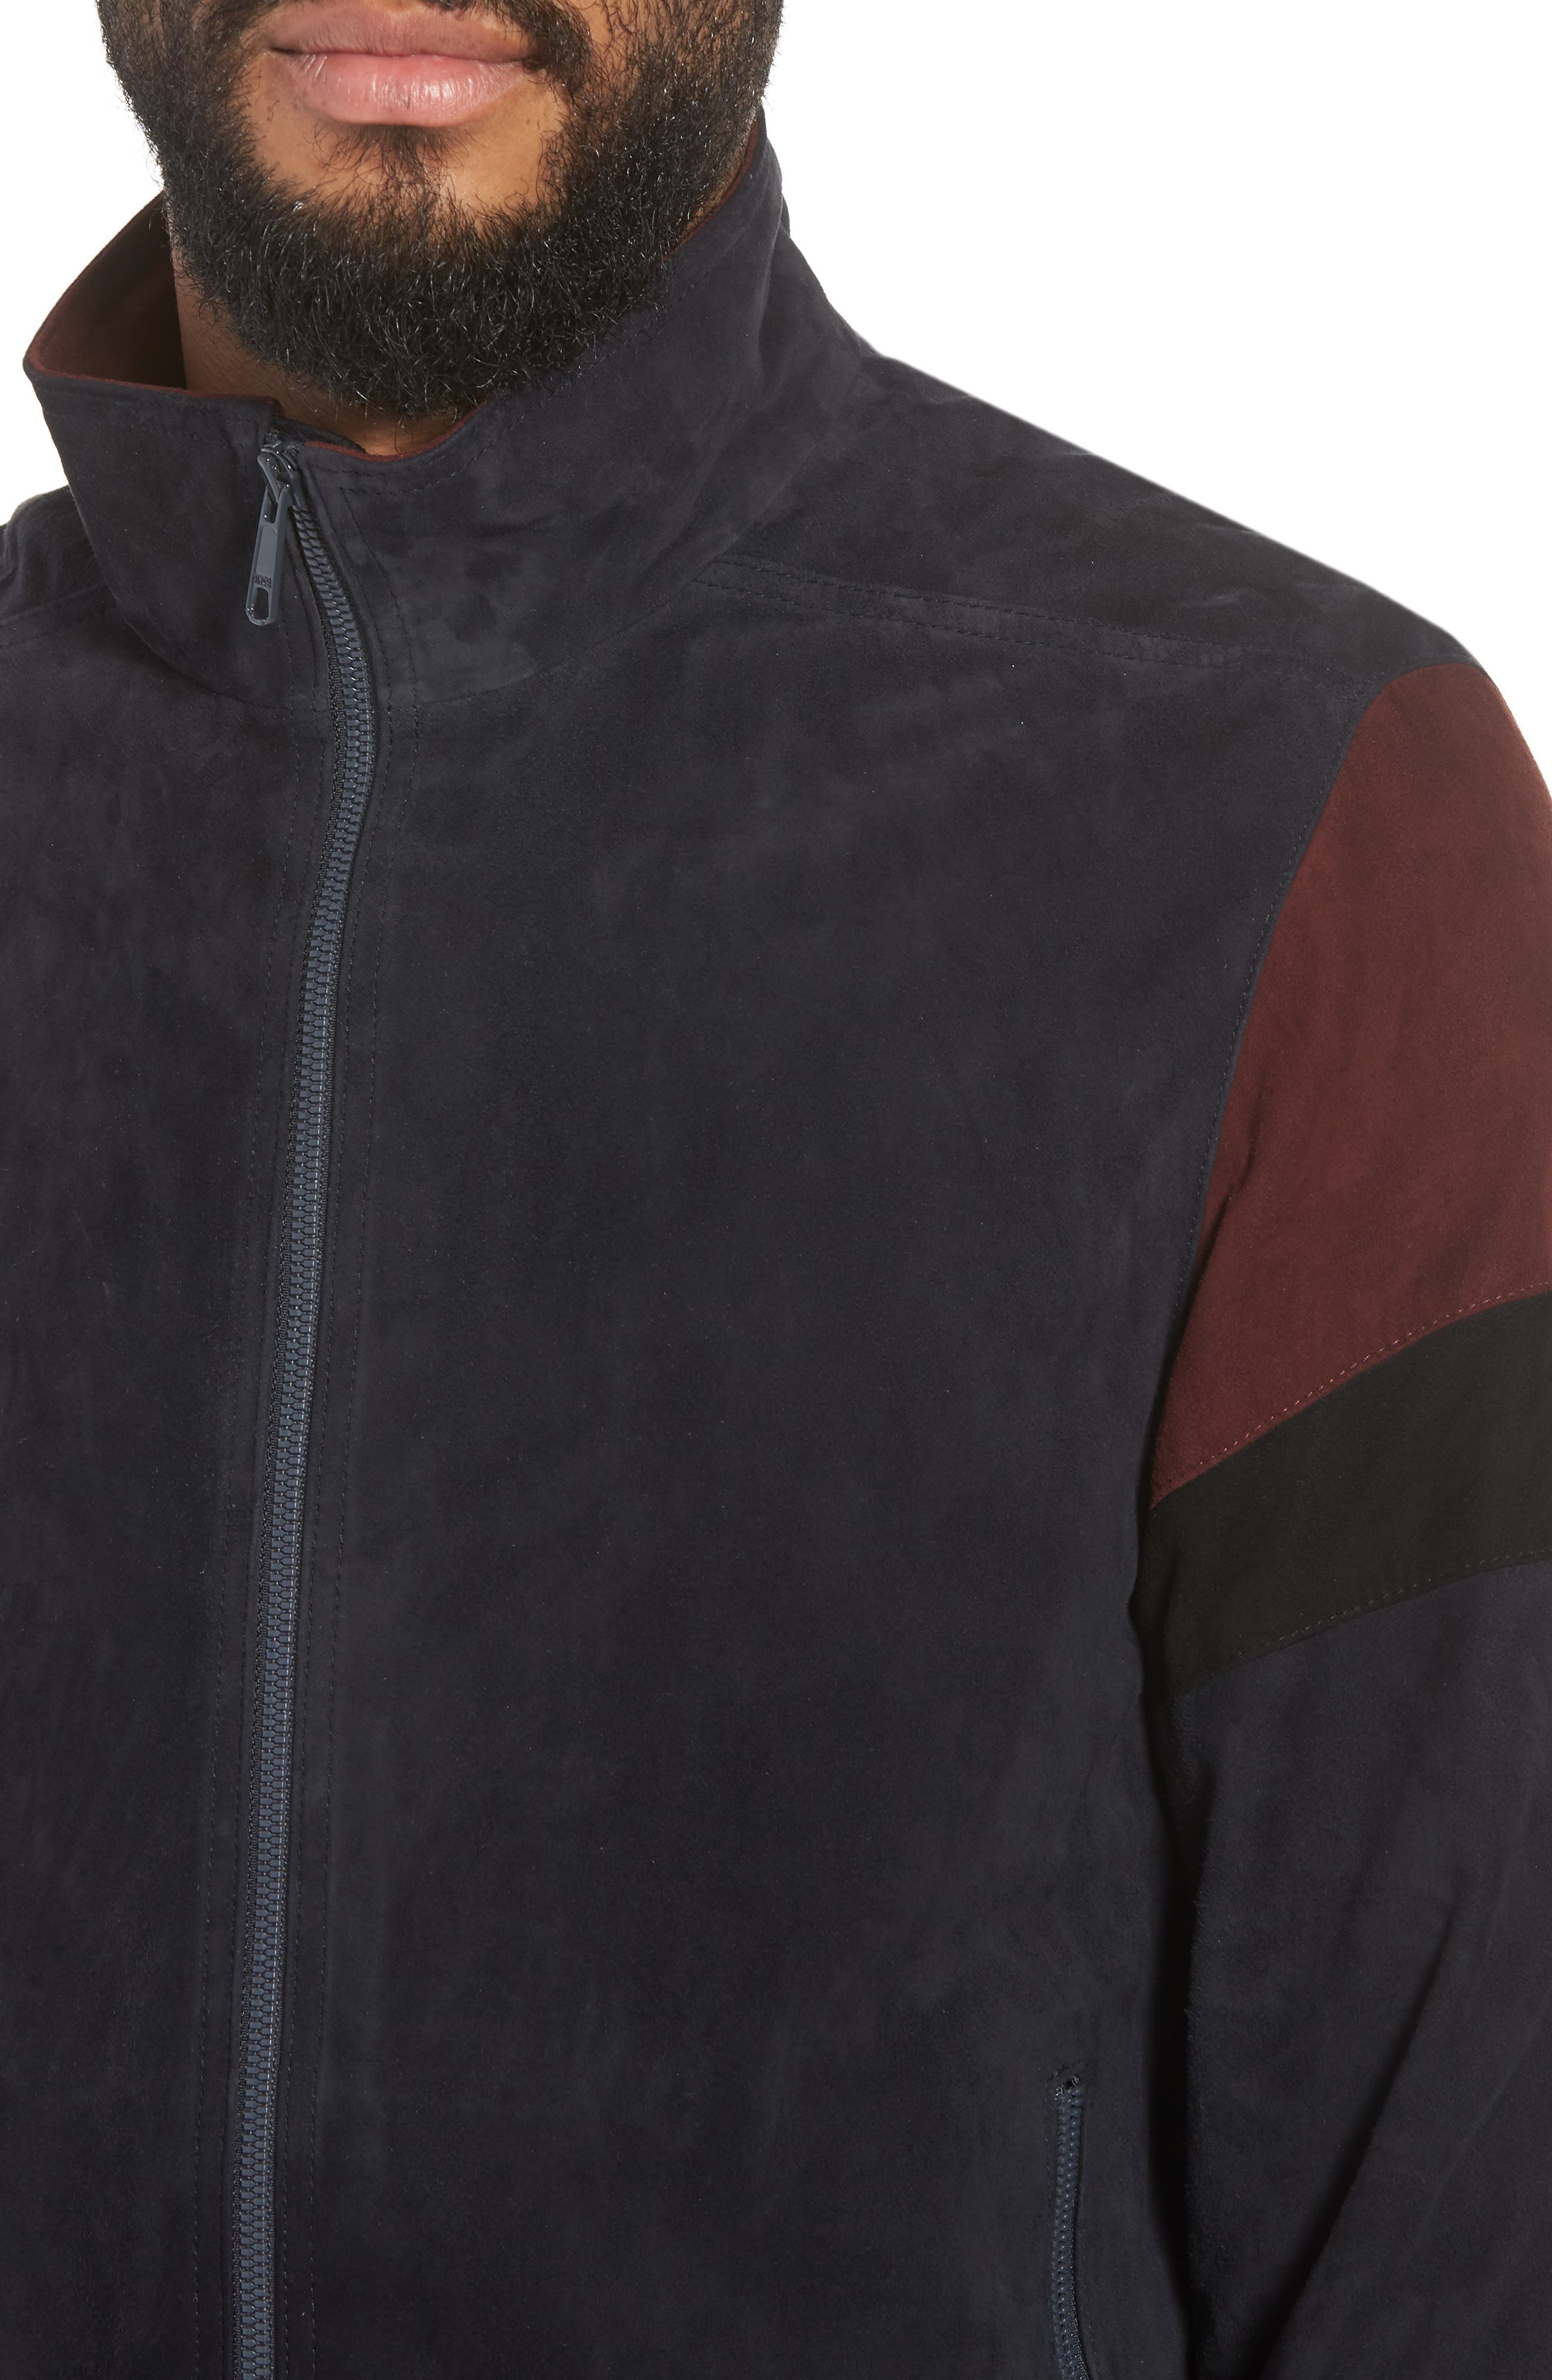 Colorblock Leather Track Jacket,                             Alternate thumbnail 4, color,                             New Coastal